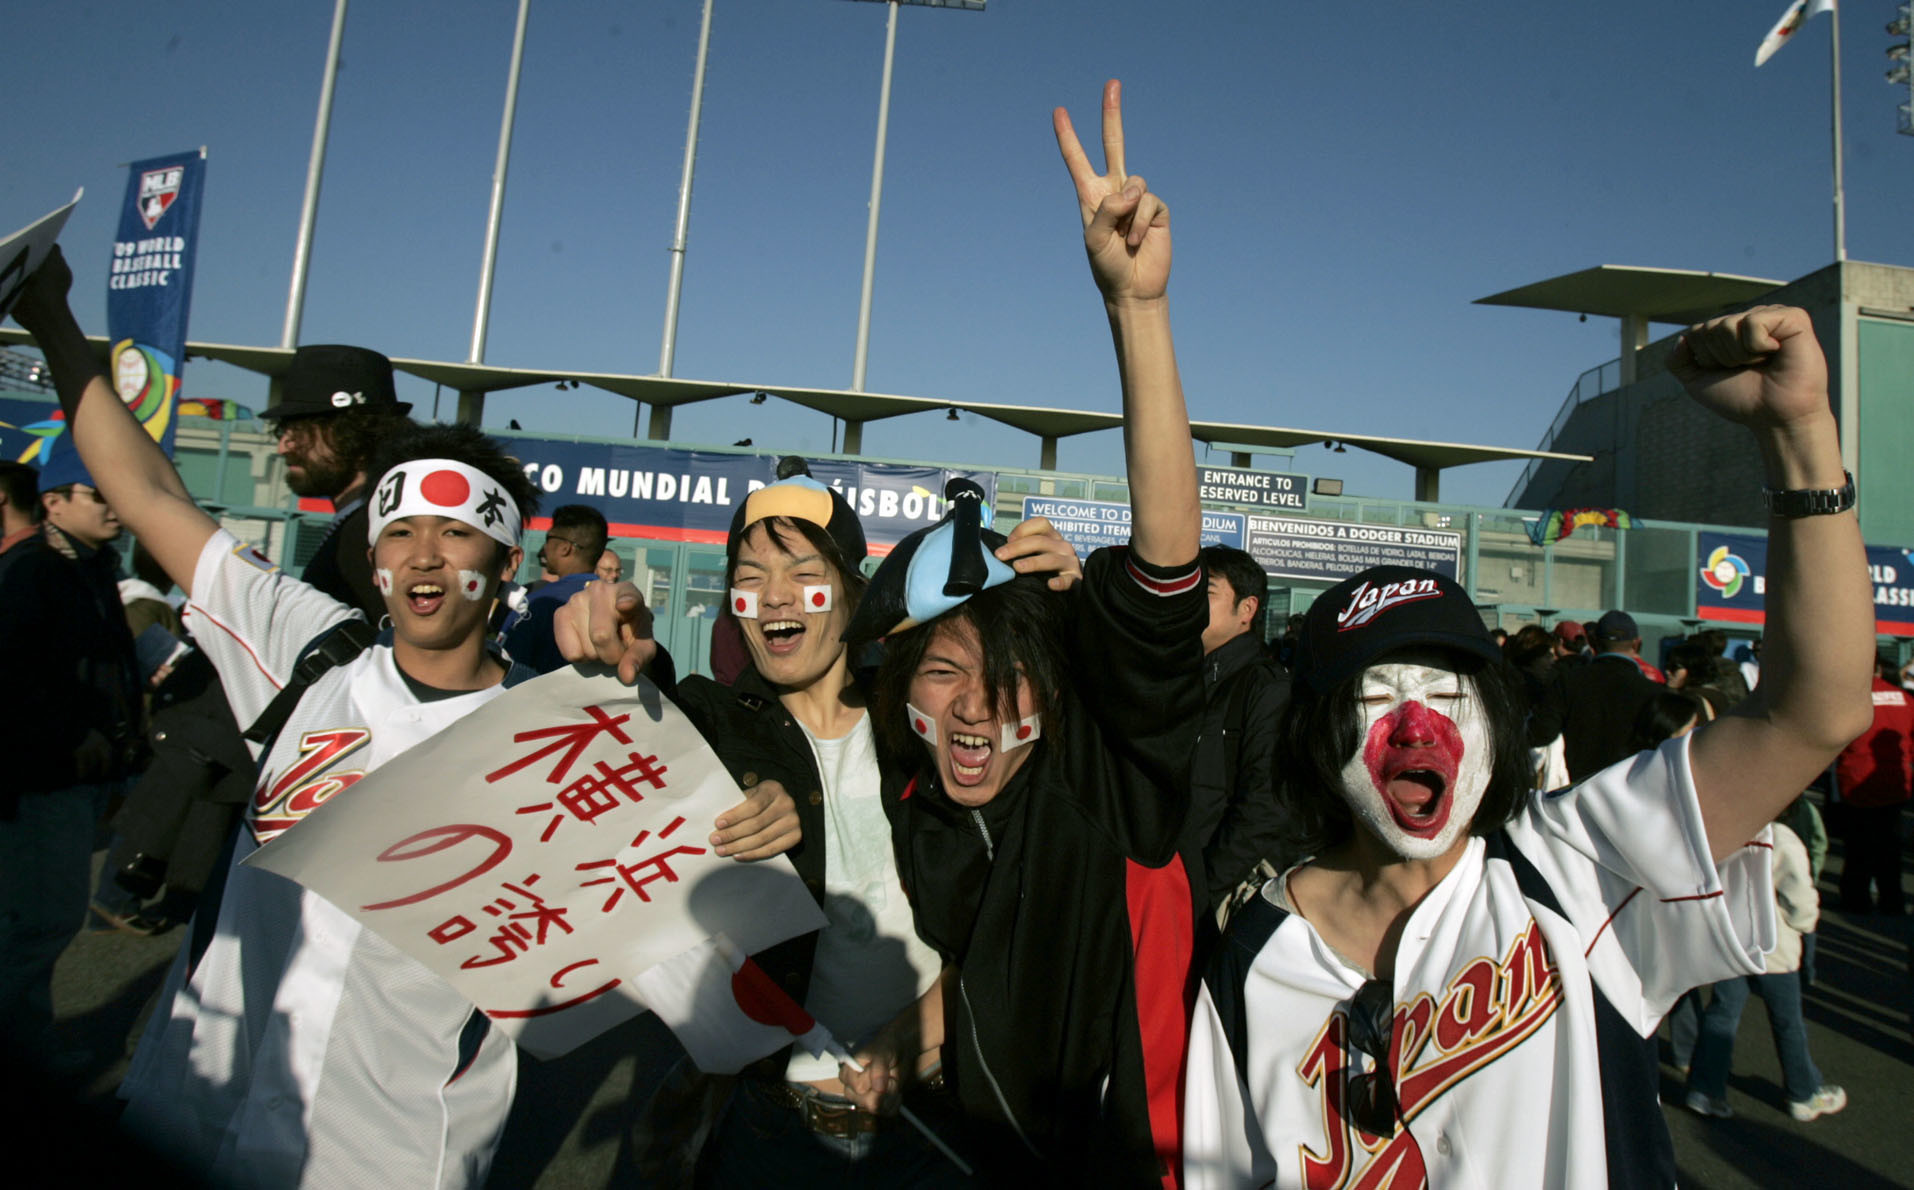 La-sp-dodger-stadium-world-baseball-classic-20160825-snap